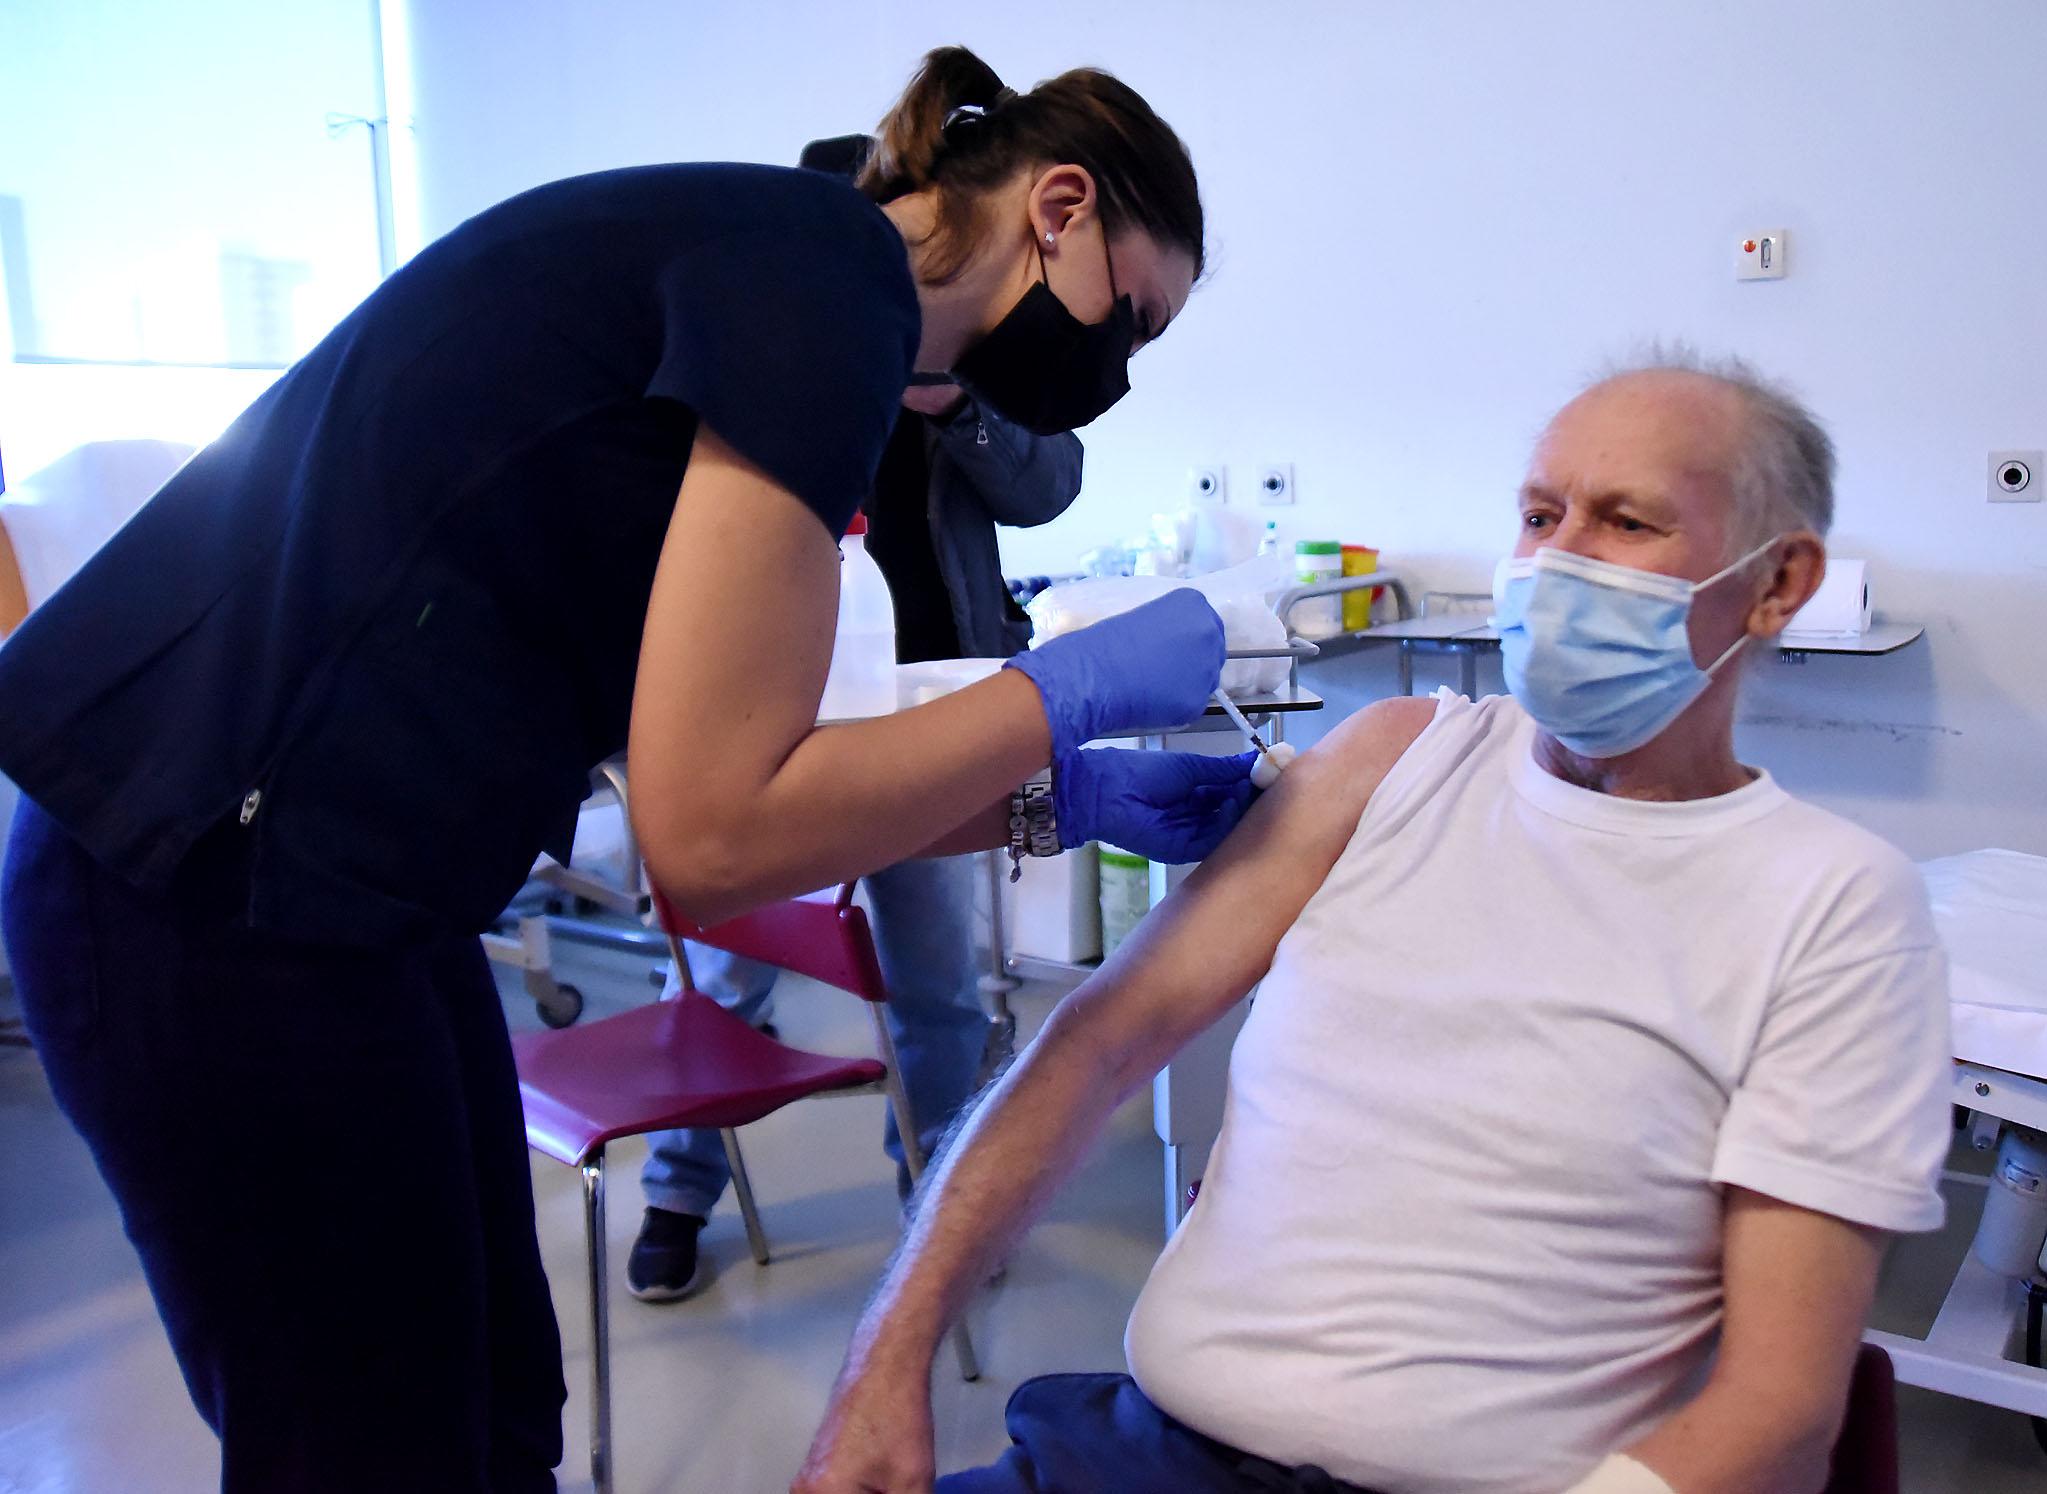 Sretan da je došao na red za cijepljenje - Karlo Hunček / Foto SERGEJ DRECHSLER